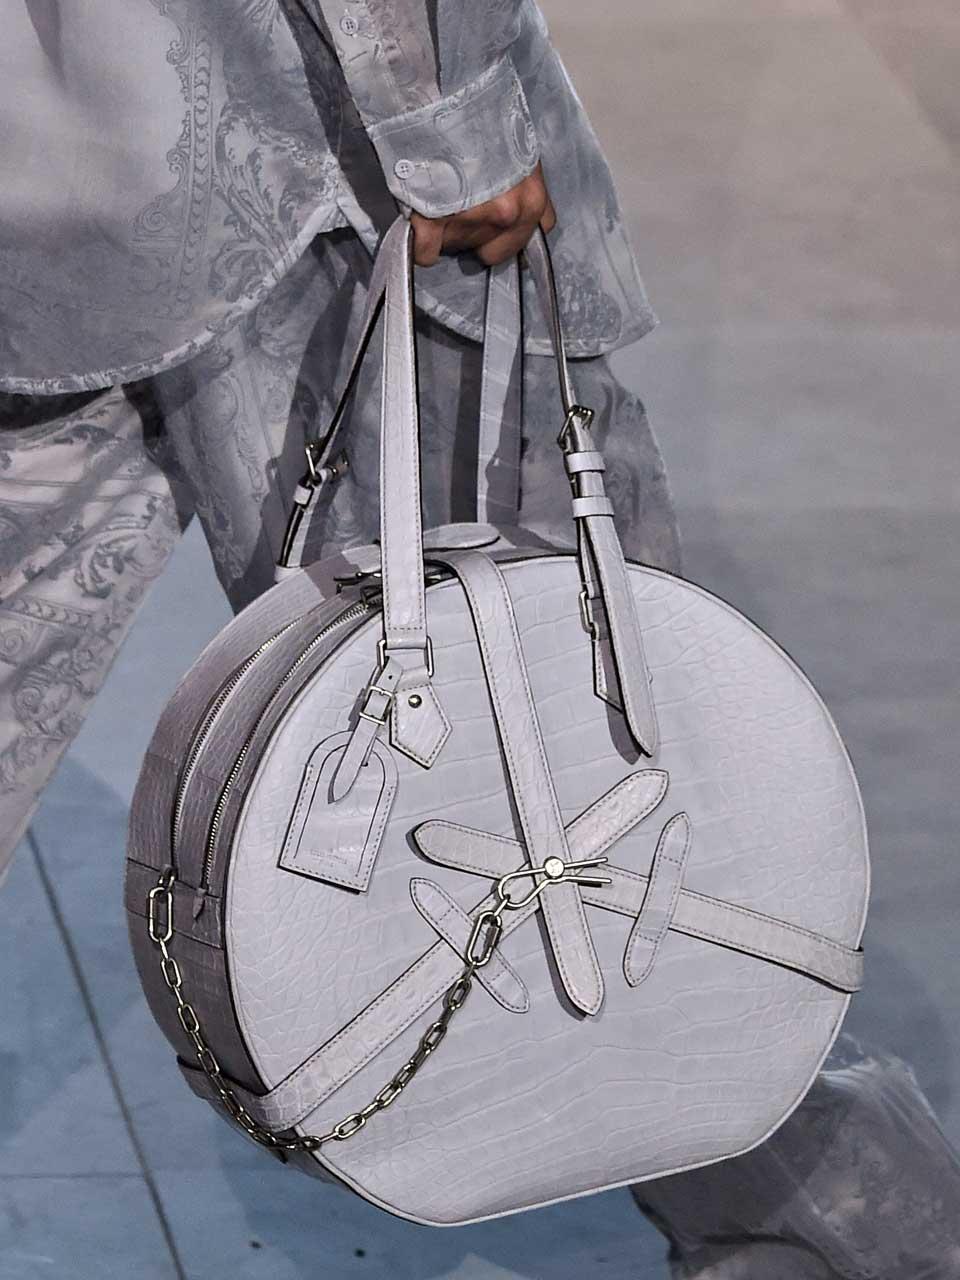 Louis-Vuitton-defile-ah-1920-cuirs-exotiques